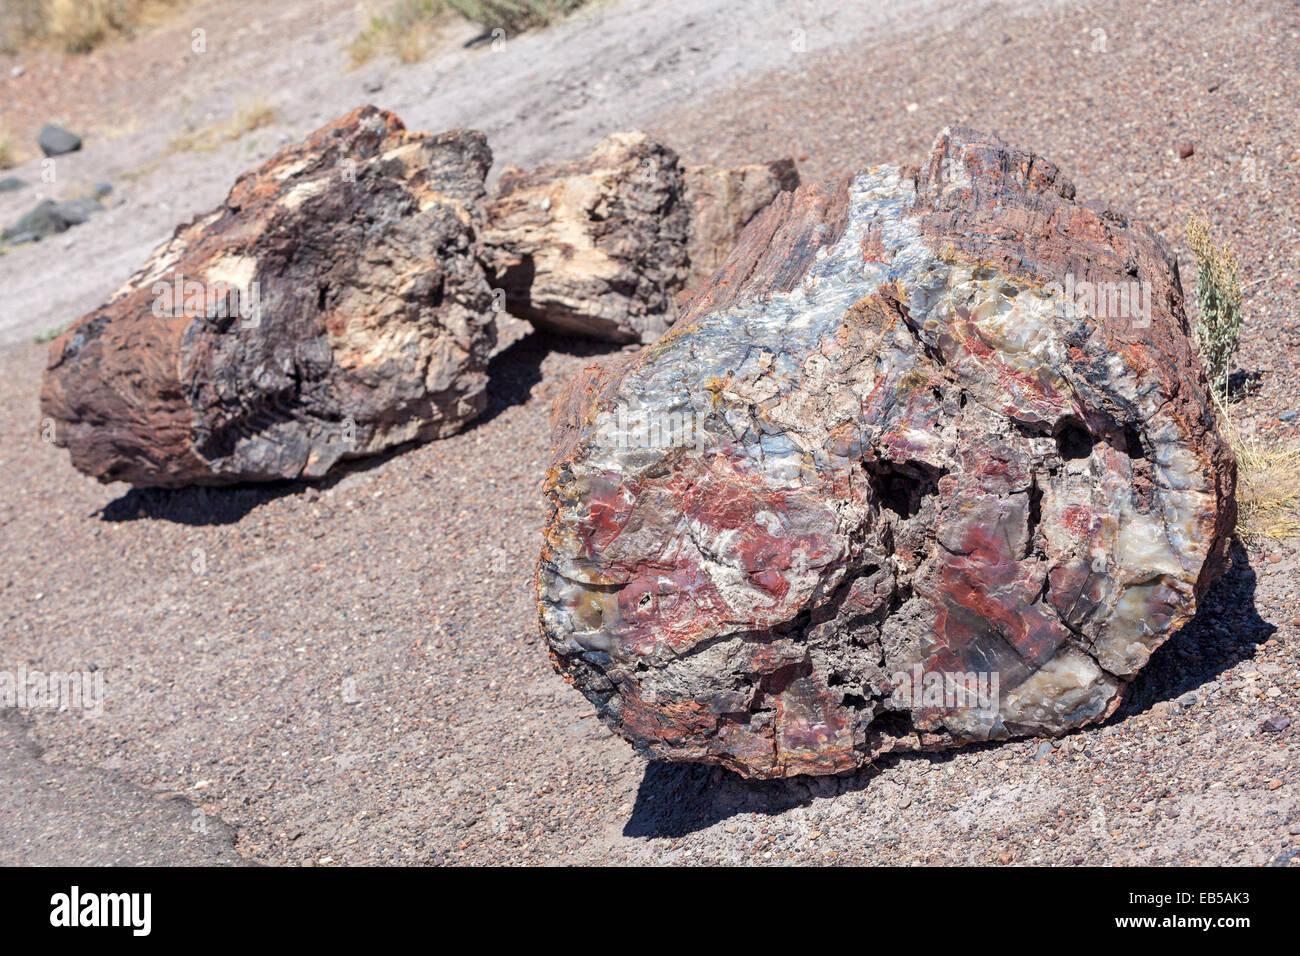 Petrified wood in the Petrified Forest National Park, Arizona. - Stock Image